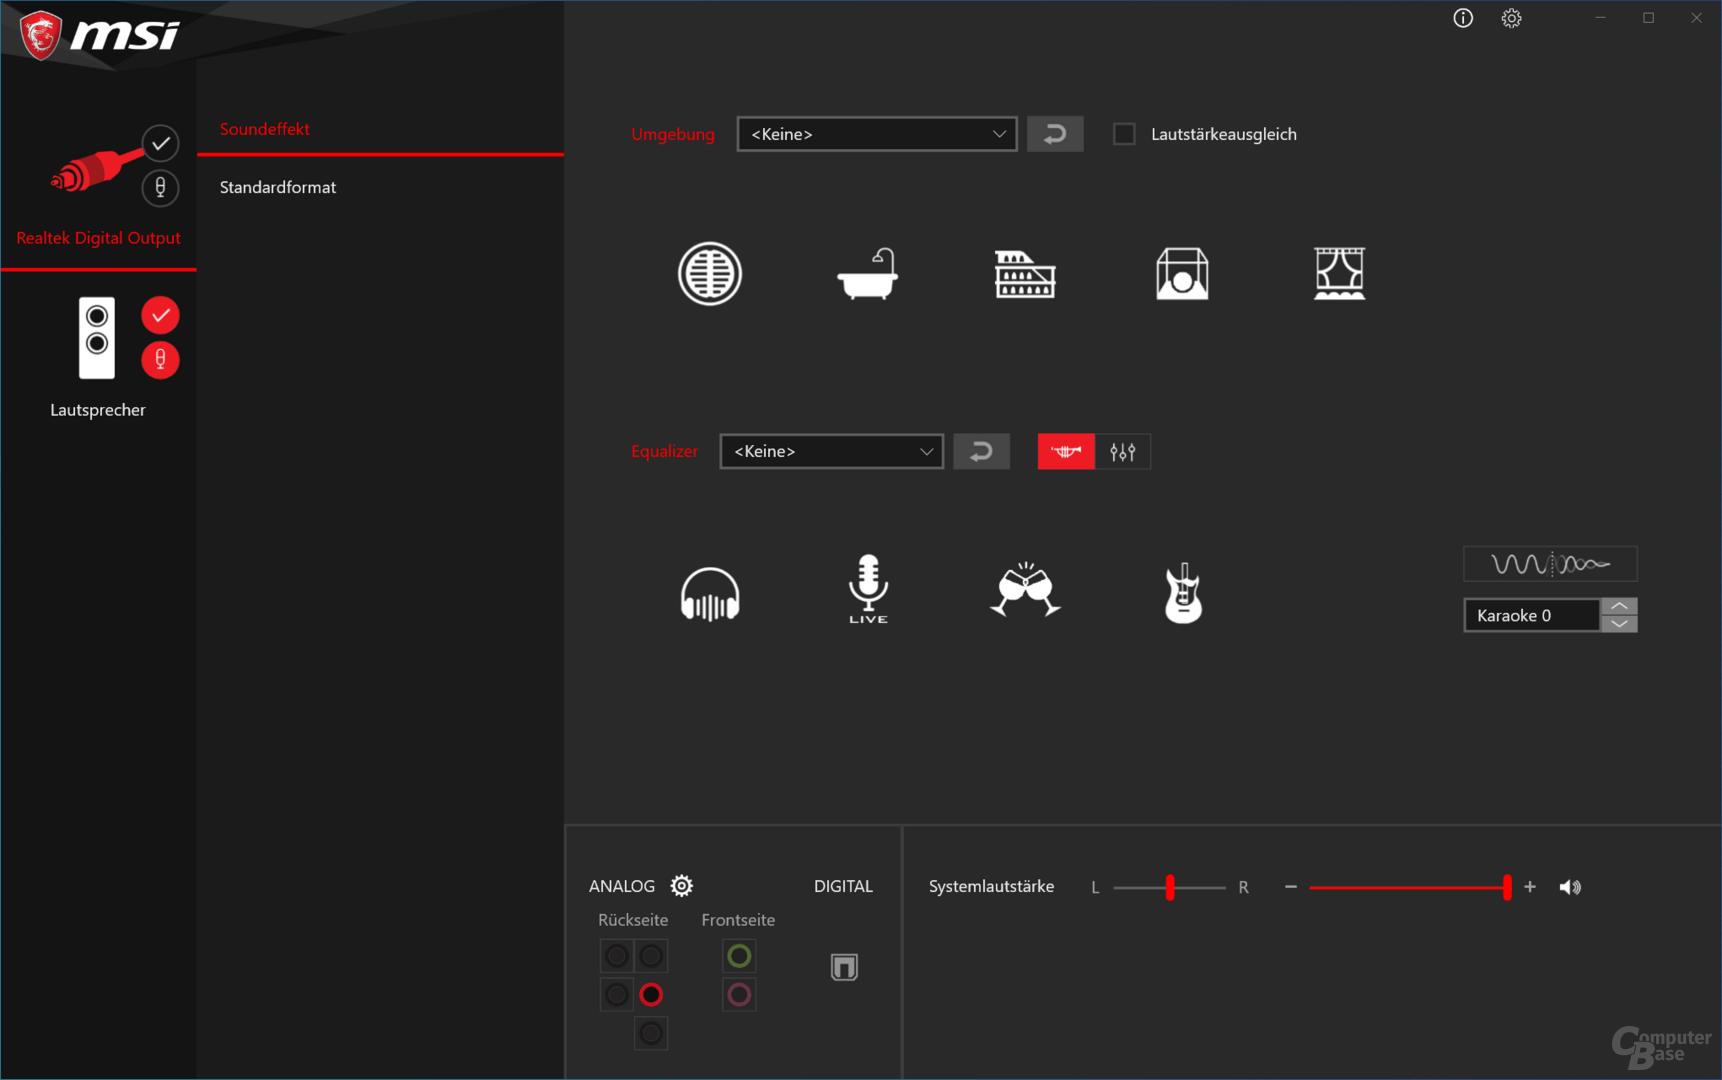 Realtek HD Audio-Manager